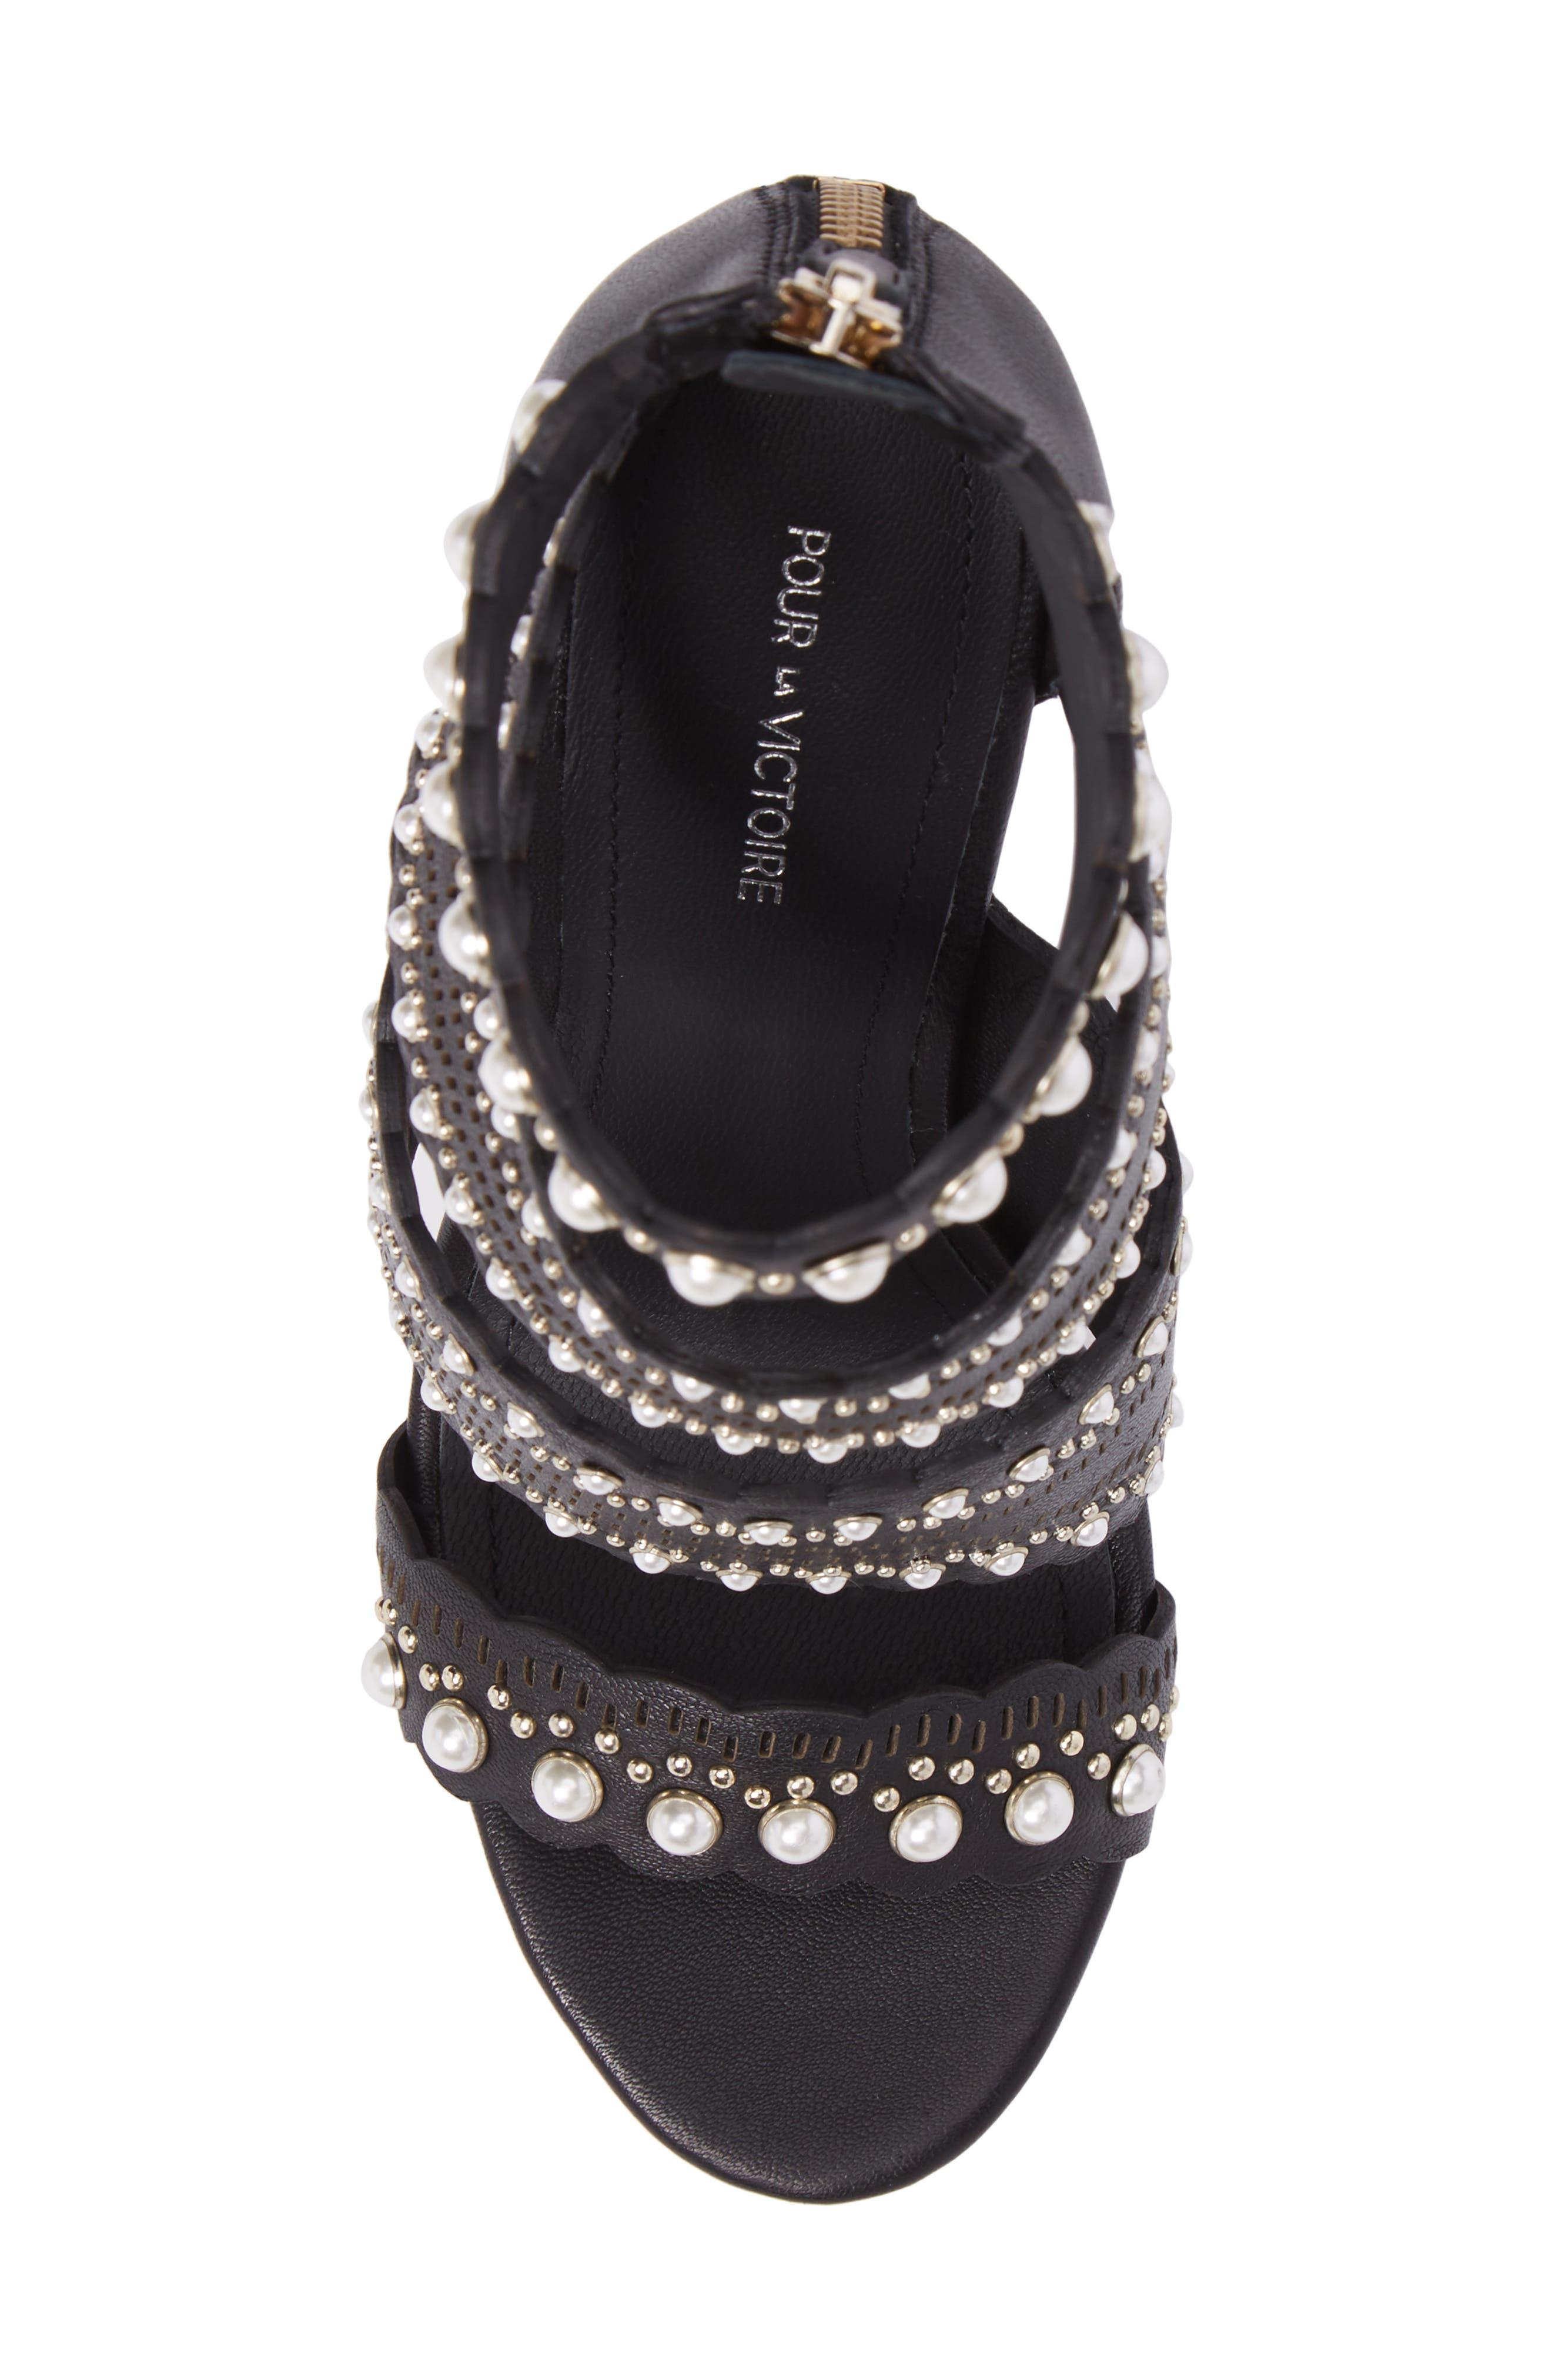 Ellura Scalloped Strap Sandal,                             Alternate thumbnail 5, color,                             Black Leather